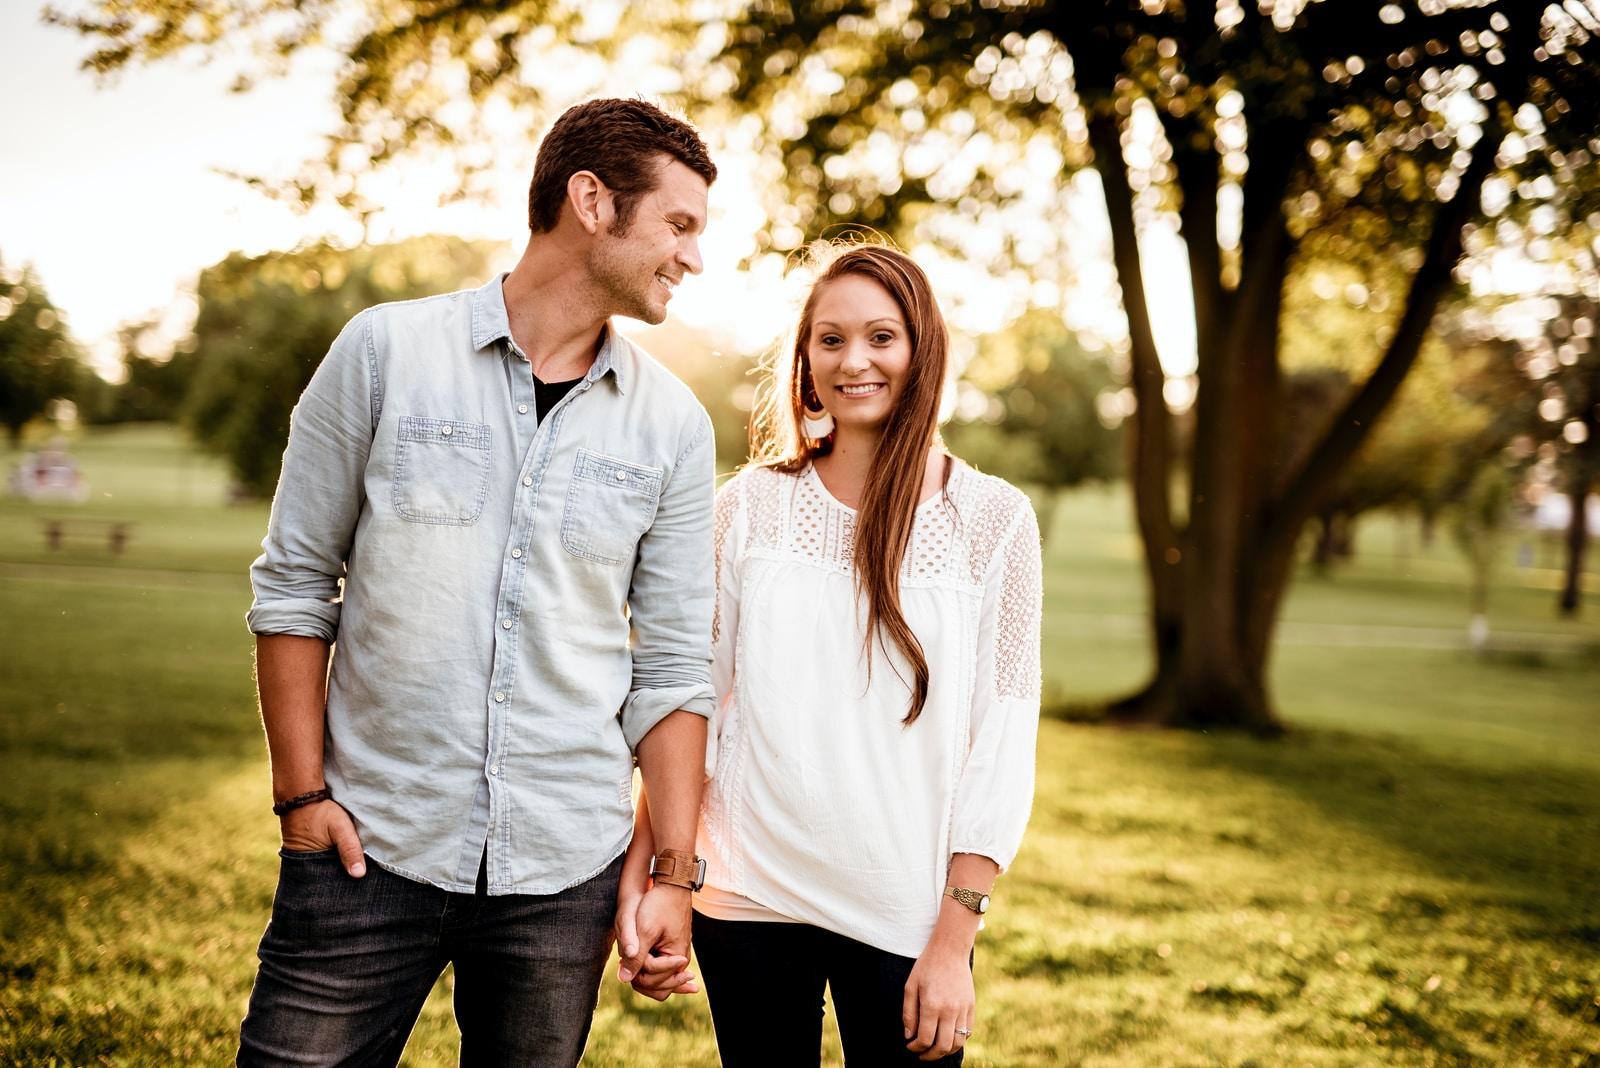 man holding hand of woman standing near tree